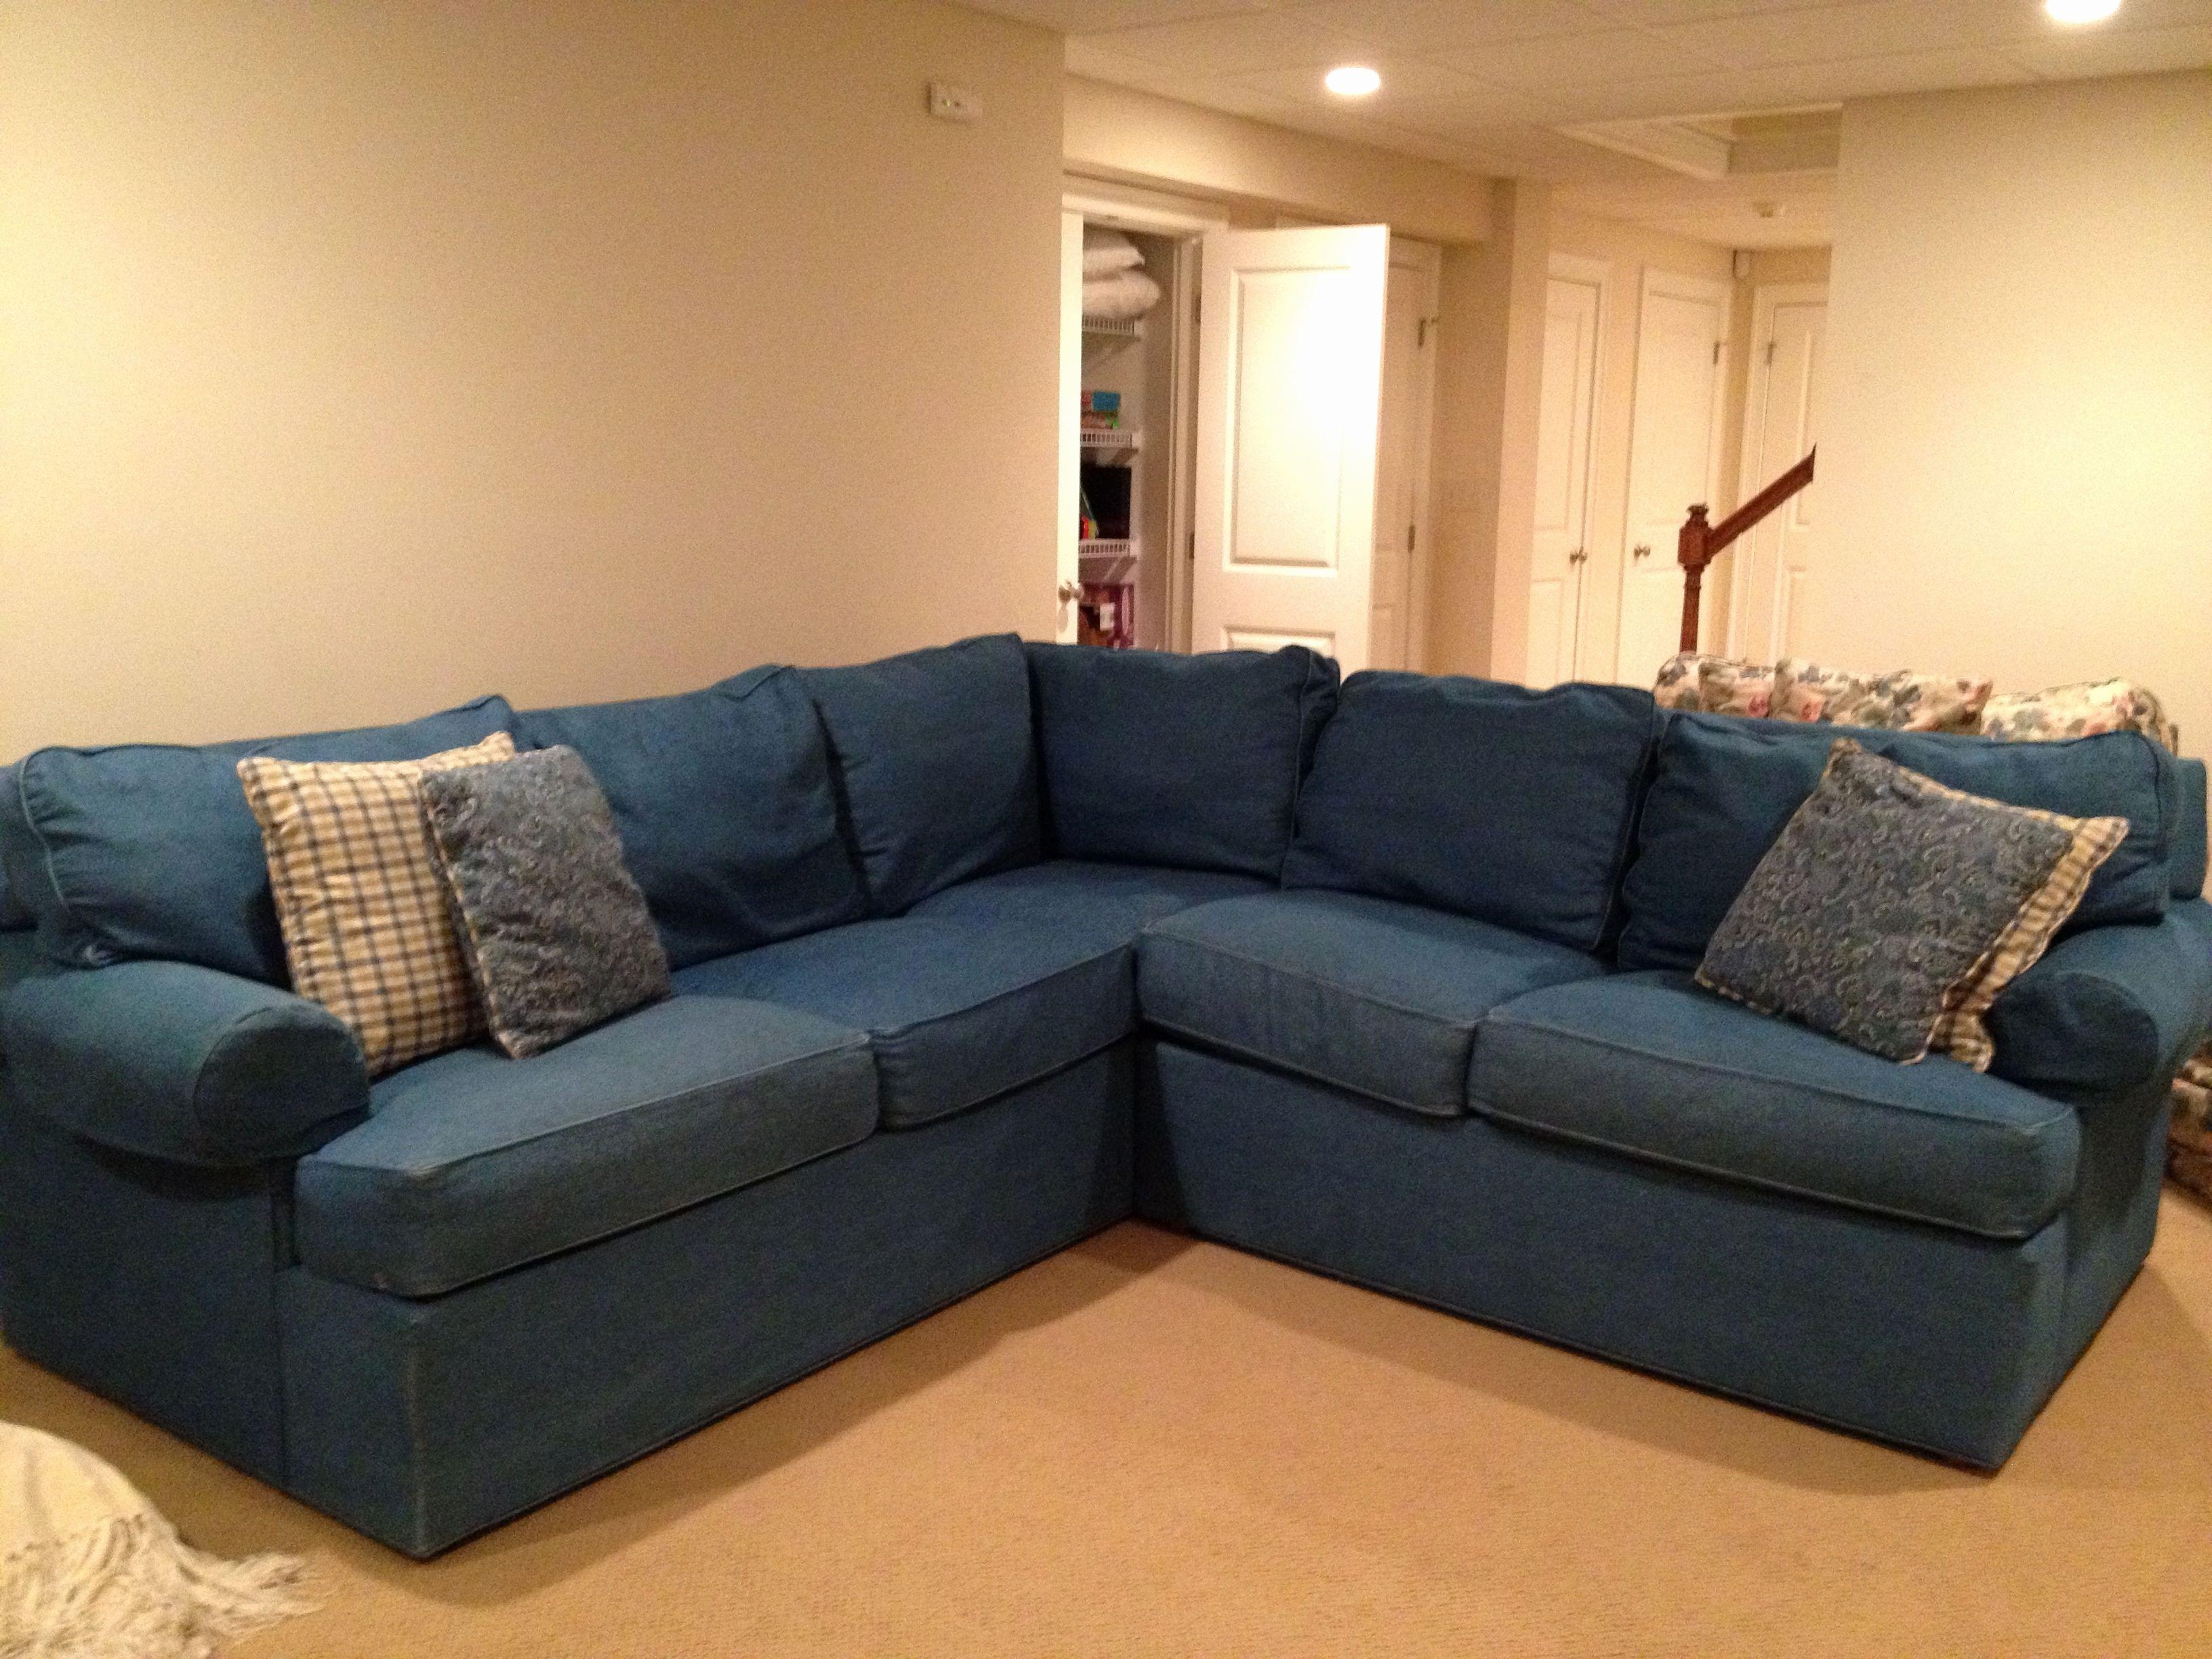 Best Of Sectional Sofas Okc Photographs Inspirational Sofa Design Brilliant Choice For